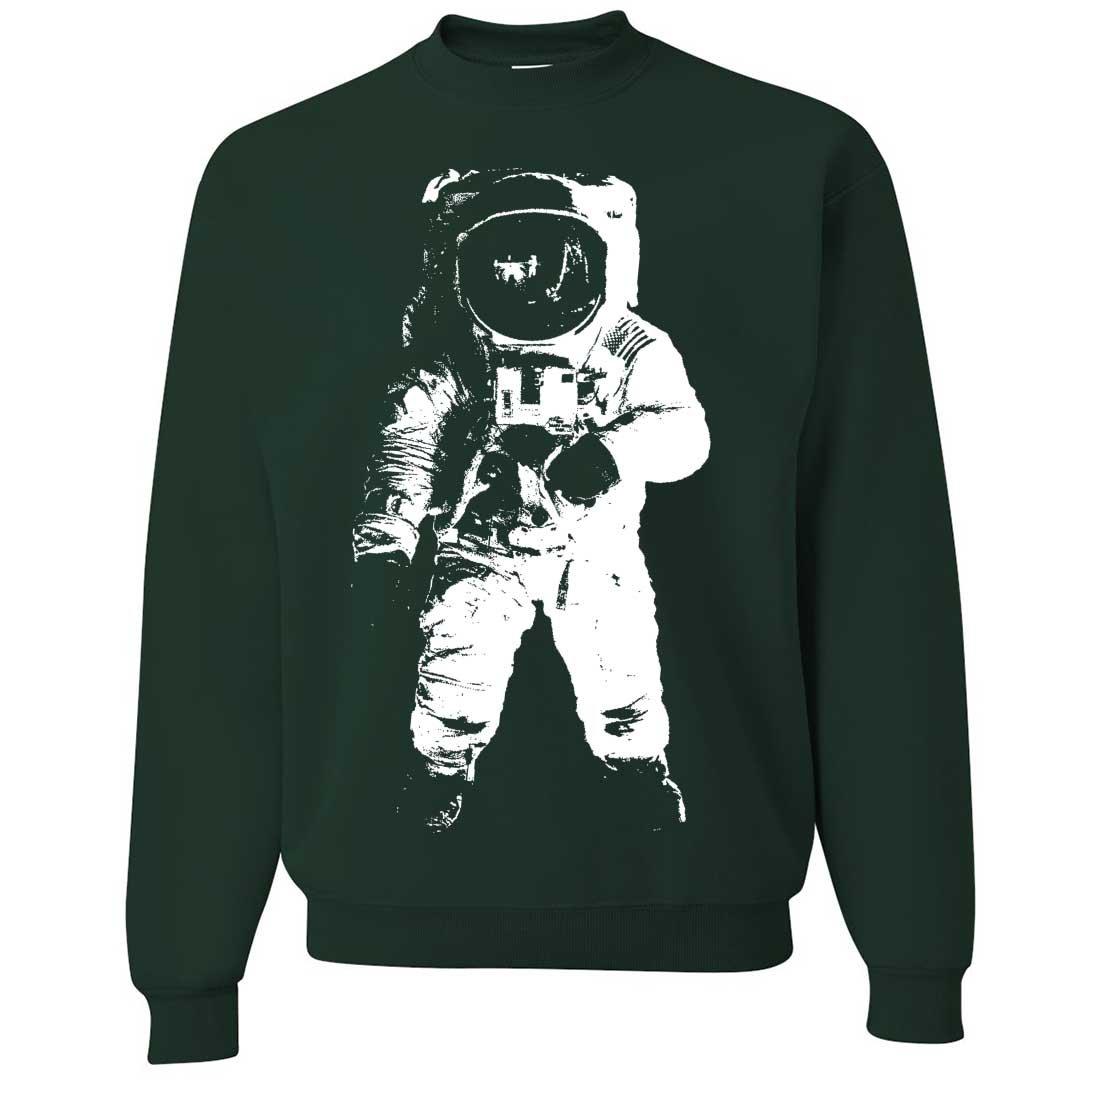 816ddd3a936b Amazon.com  Space Astronaut Man on the Moon White Print Crewneck Sweatshirt   Clothing